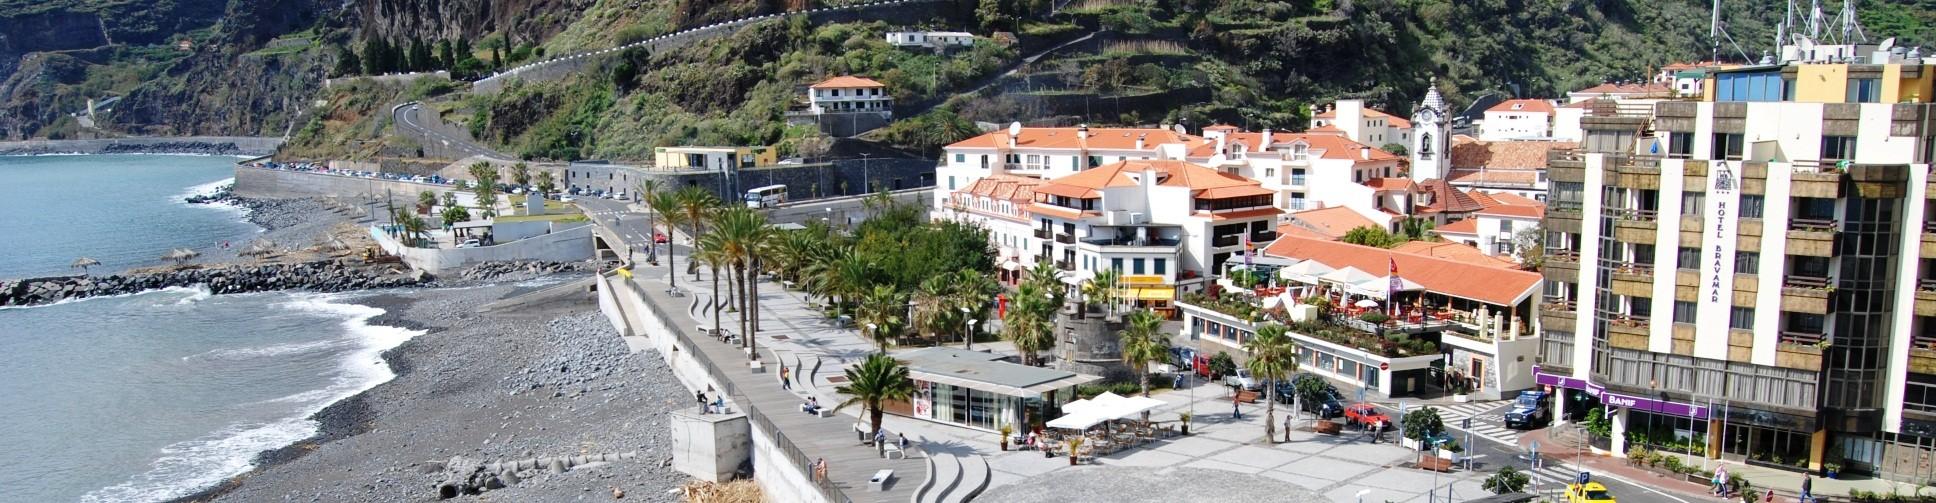 Manor-house of the Herédias in Ribeira Brava, Madeira